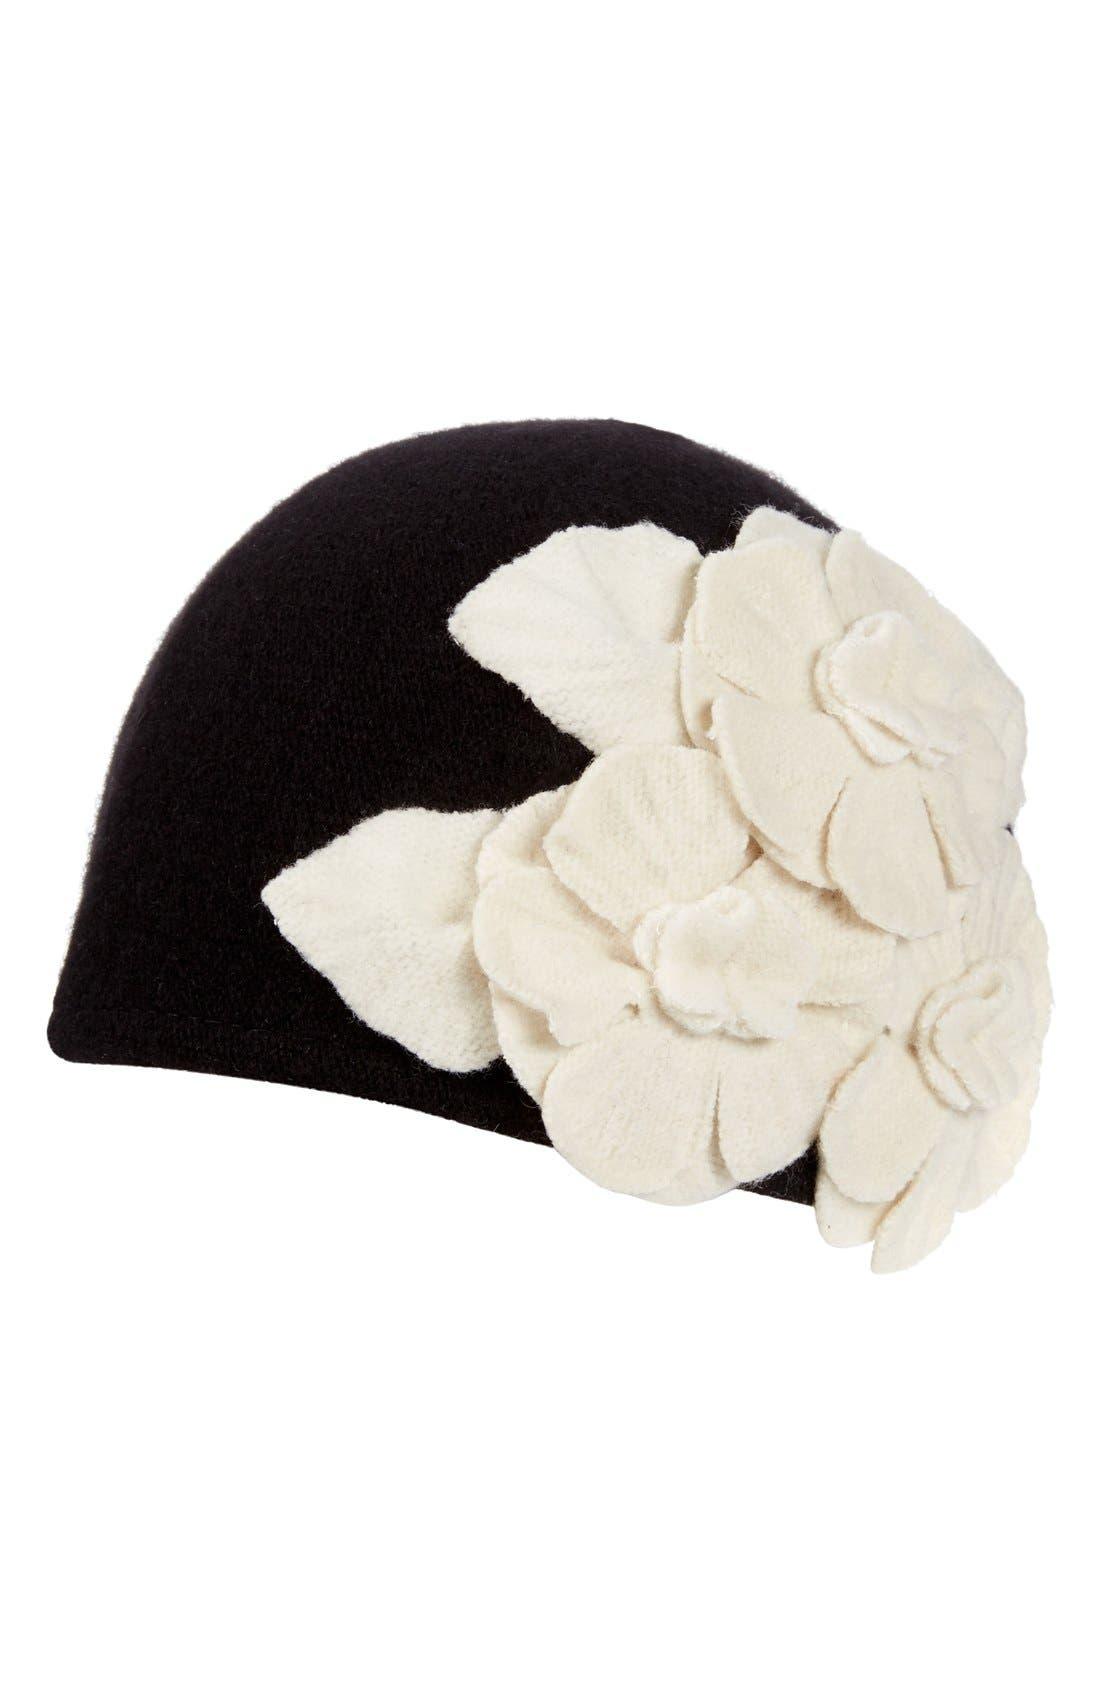 Floral Embellished Cap,                             Main thumbnail 1, color,                             Black/ Natural